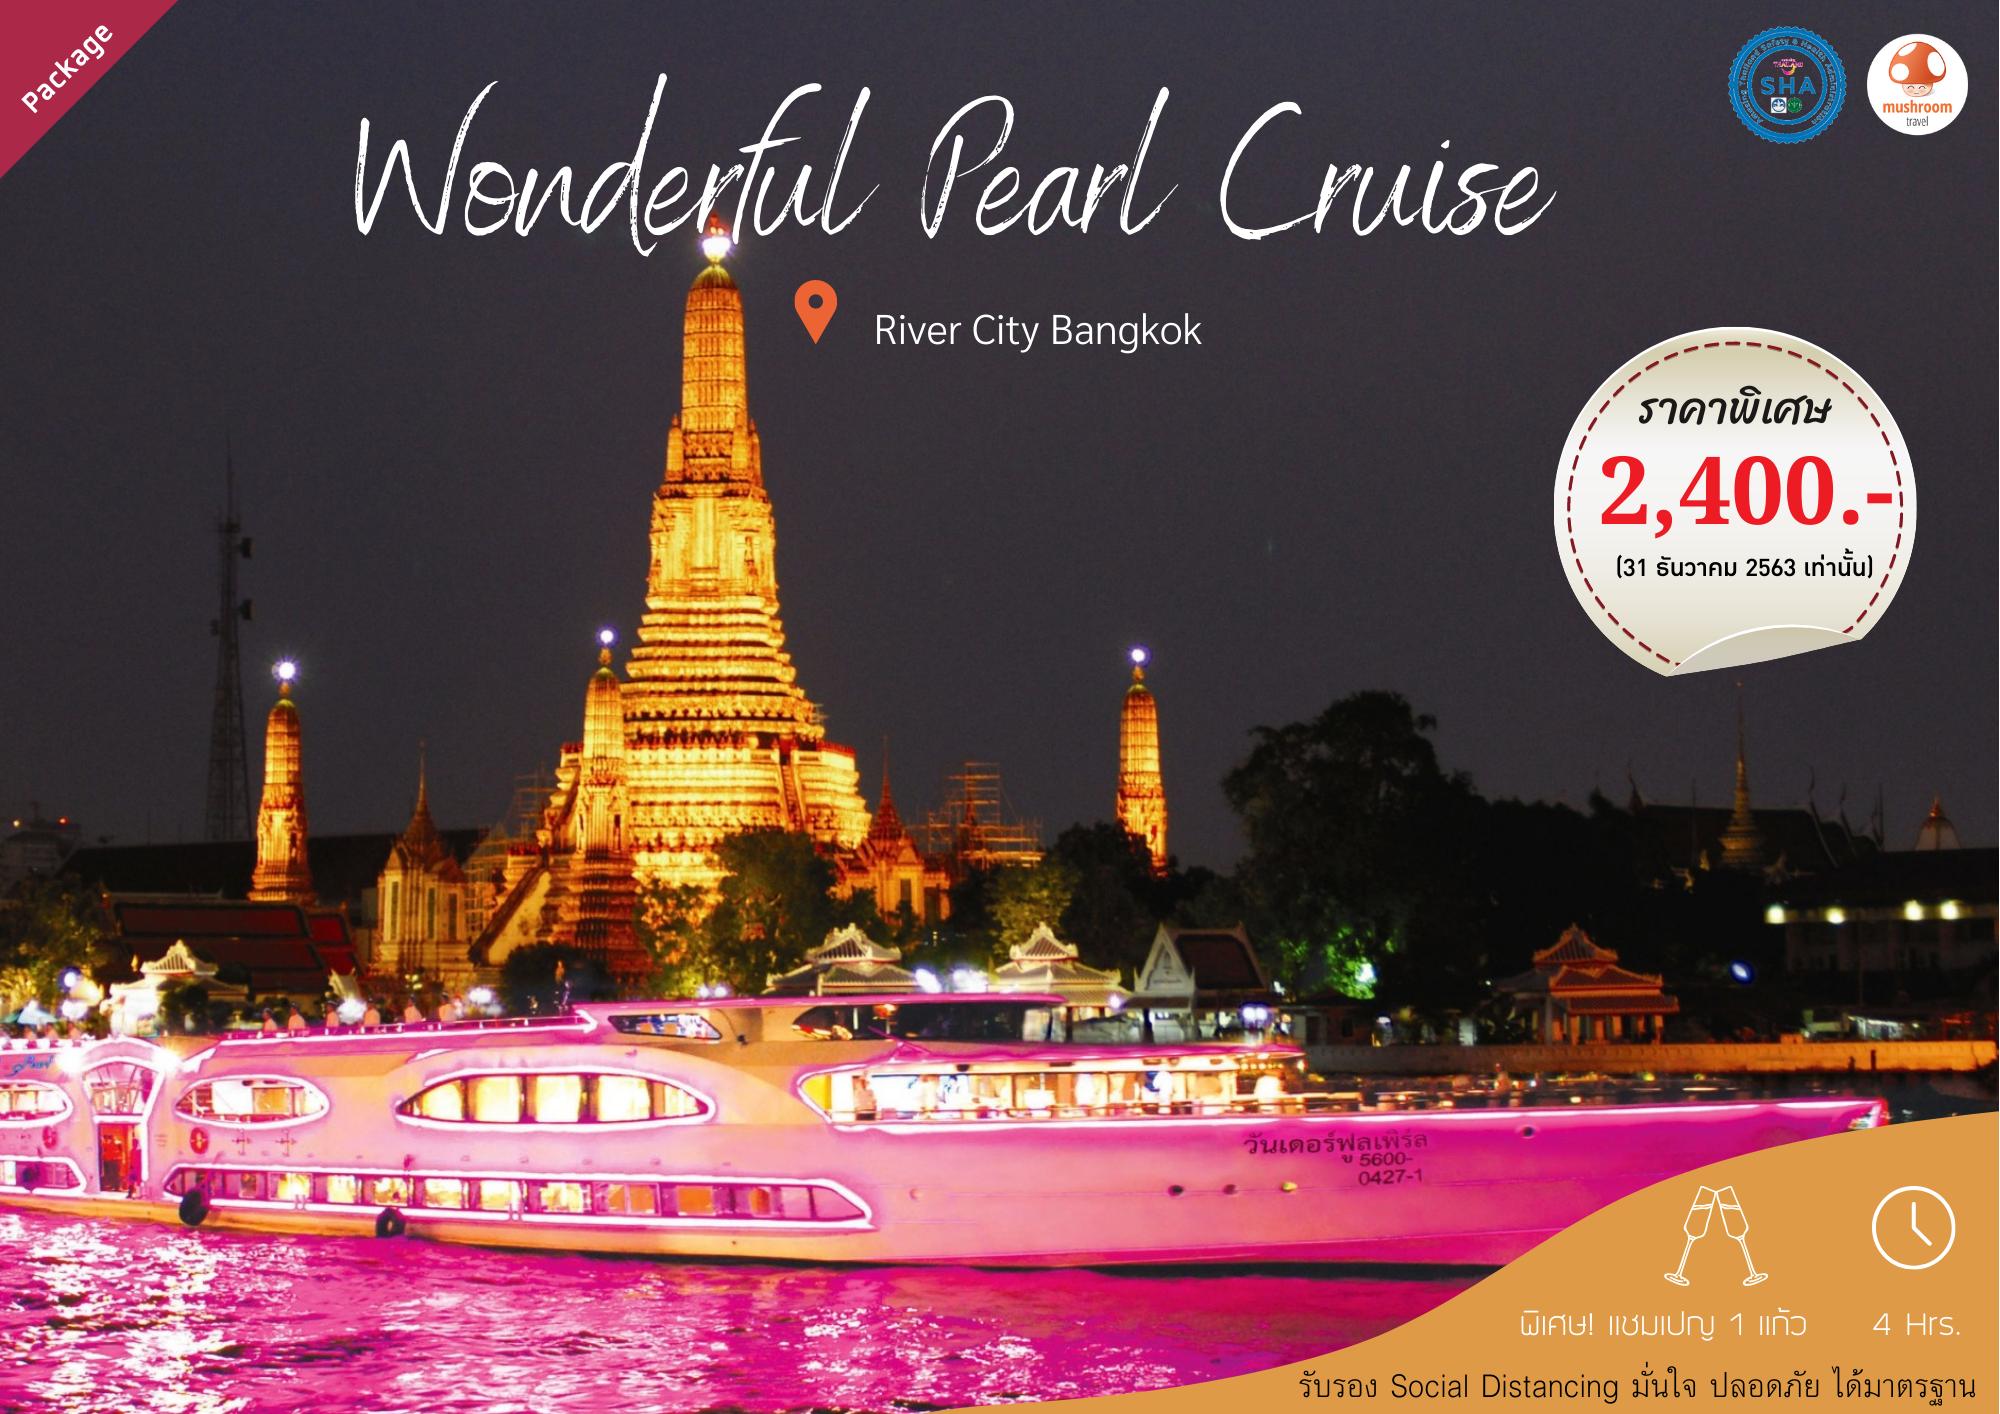 MUSHEASY 081 แพคเก็จดินเนอร์ ล่องเรือ Wonderful Pearl Cruise ราคาเริ่มต้น 890 บาท